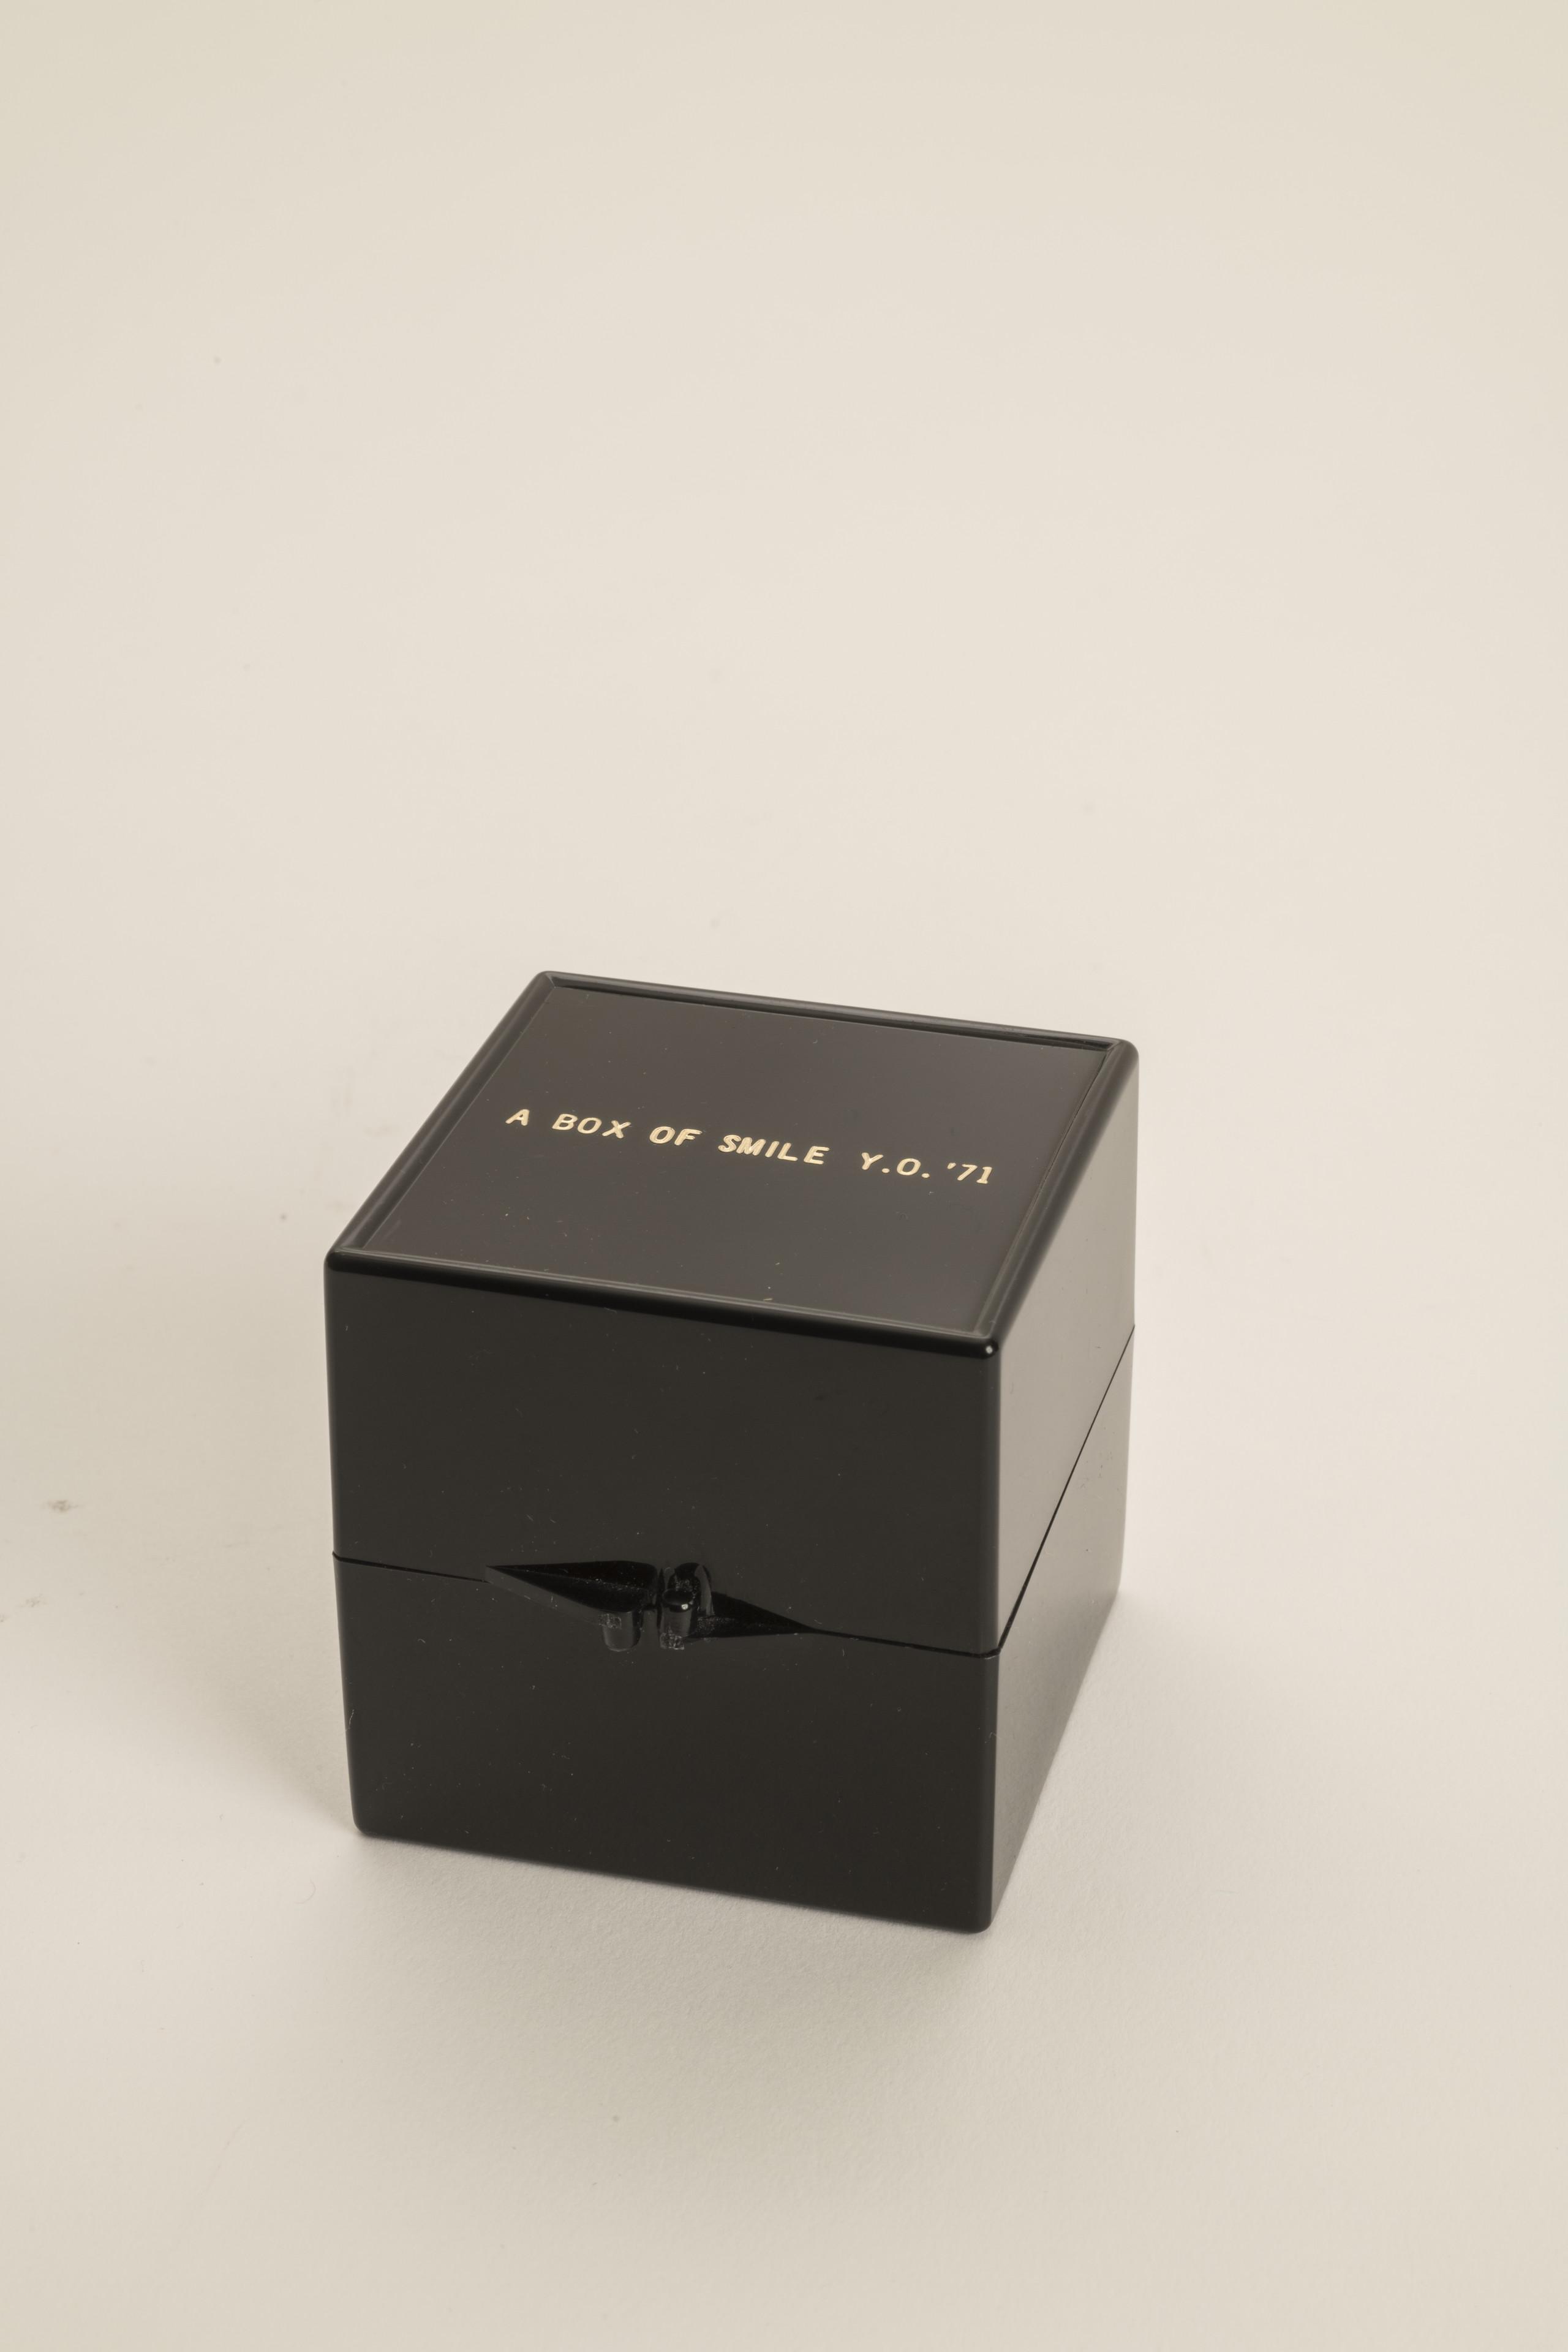 A small black square box that has